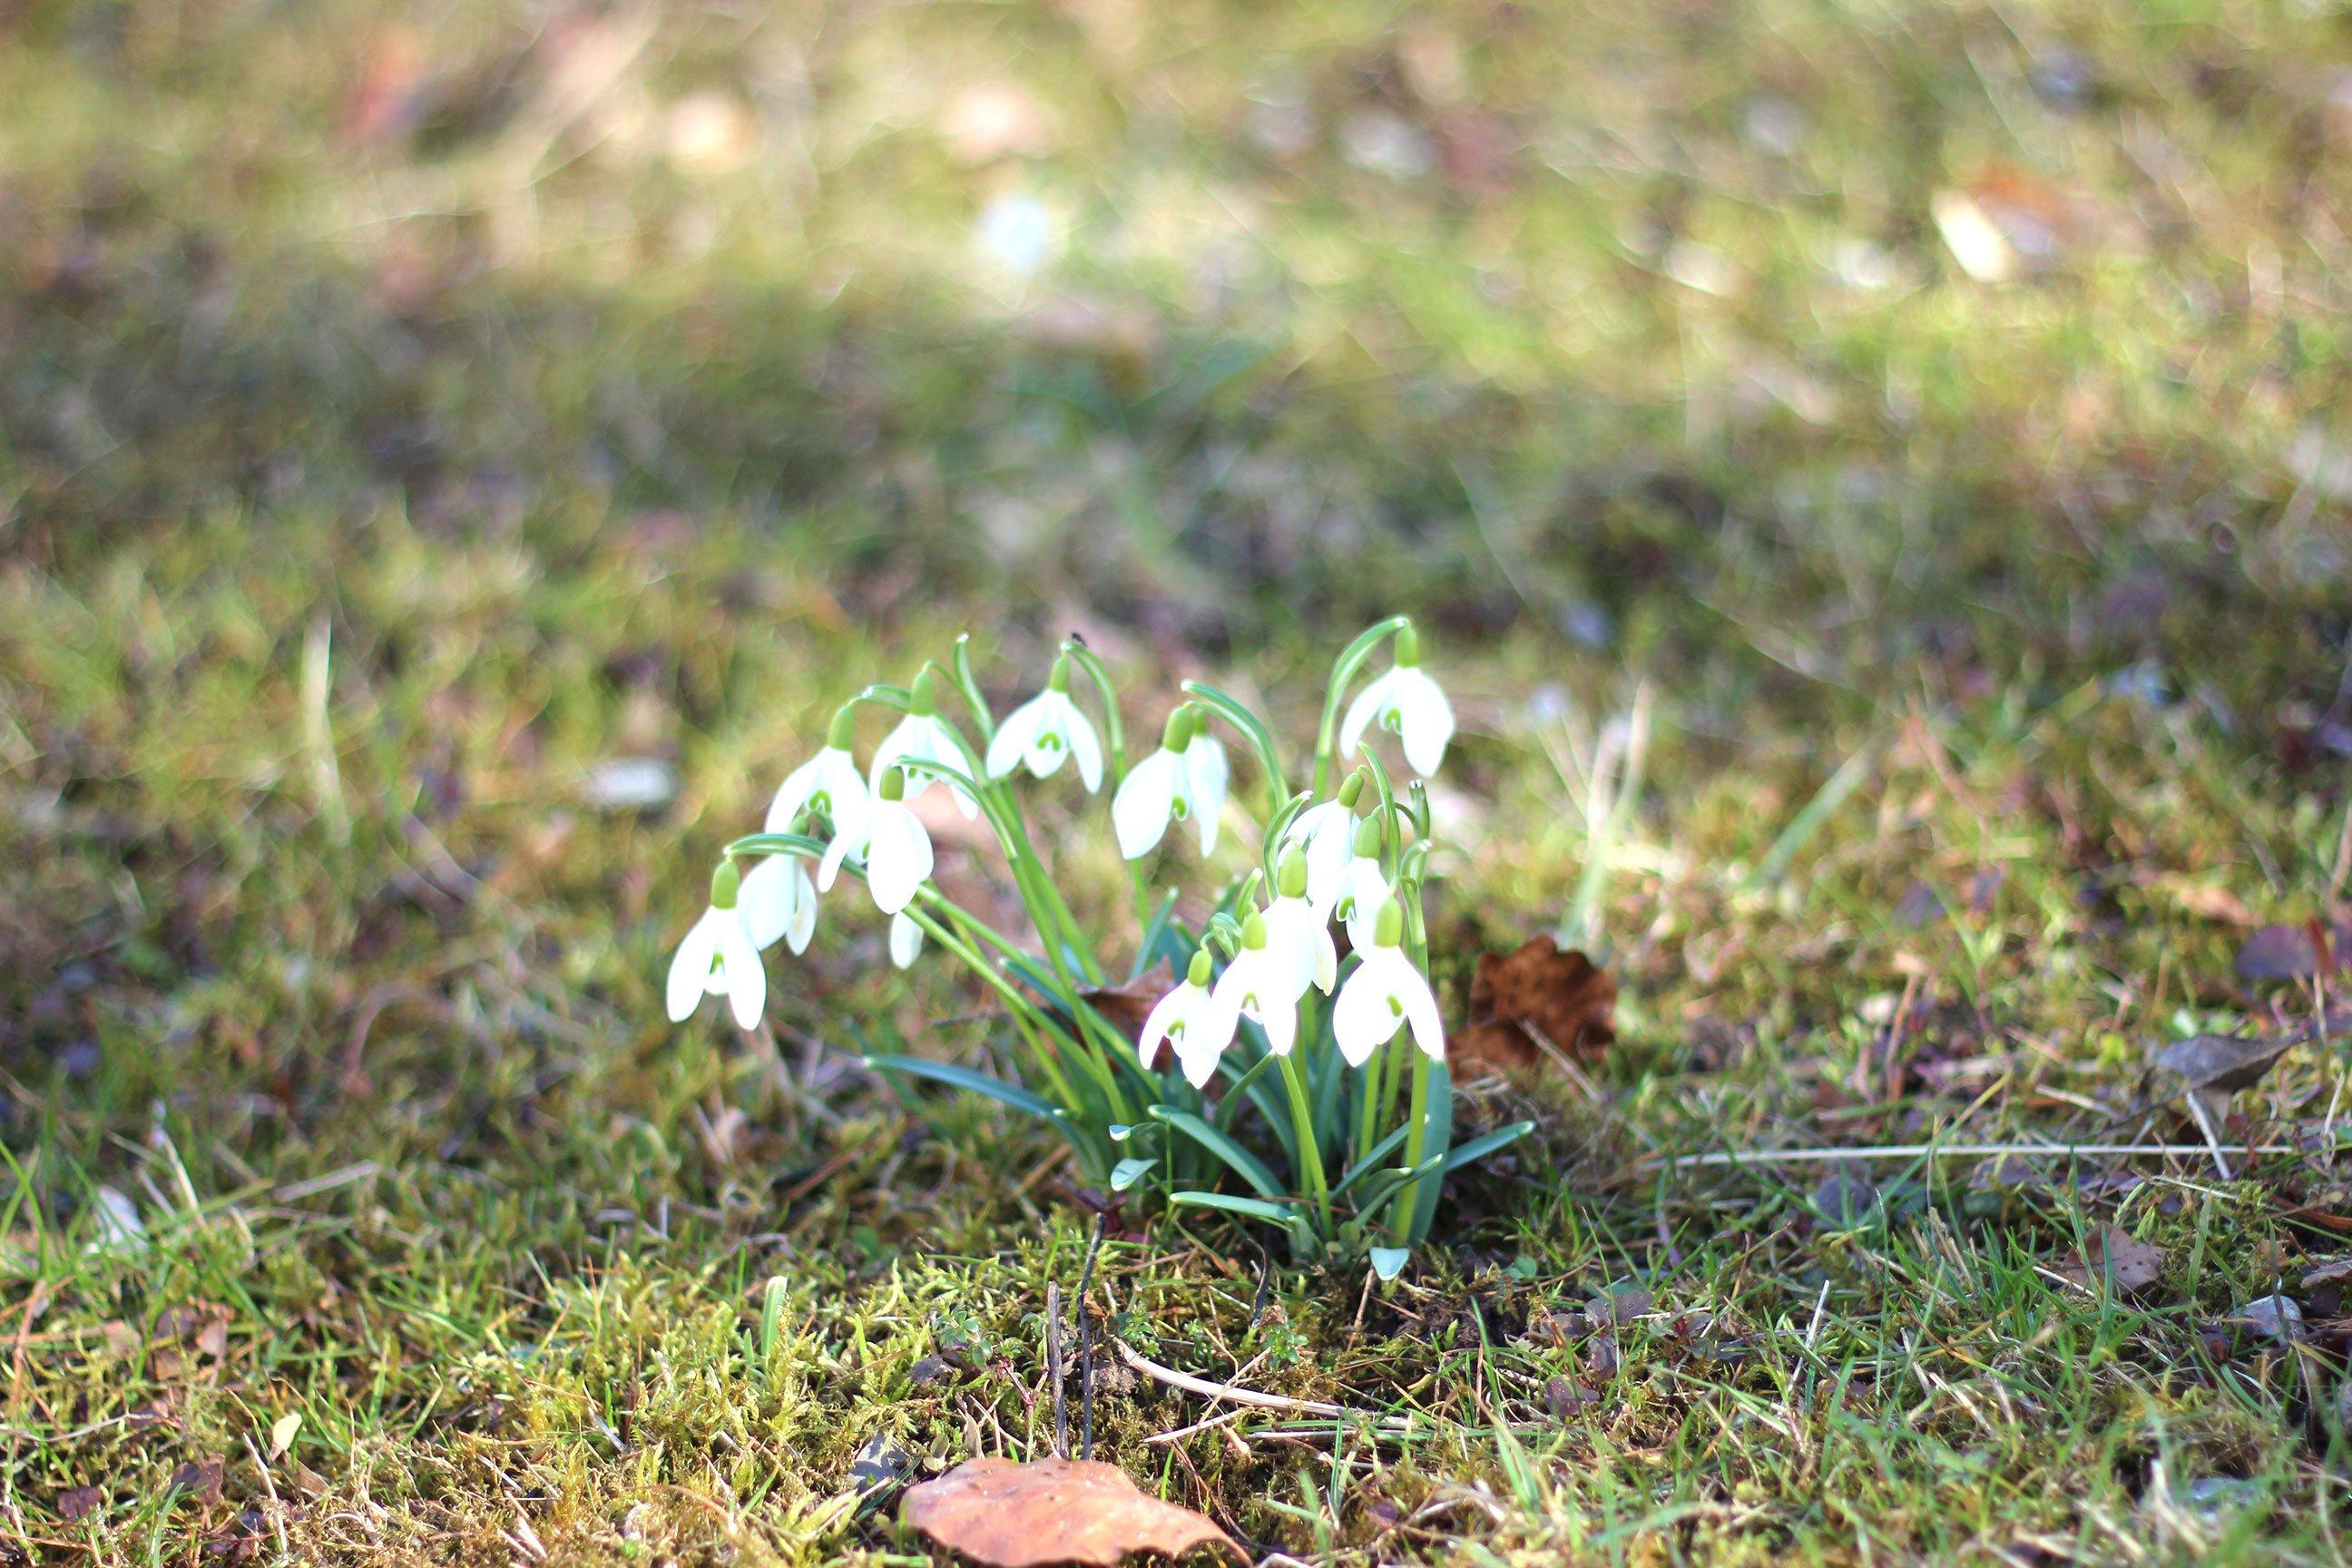 Schneeglöckchen, Frühling, Bayern, conny Doll, Lifestyleblog